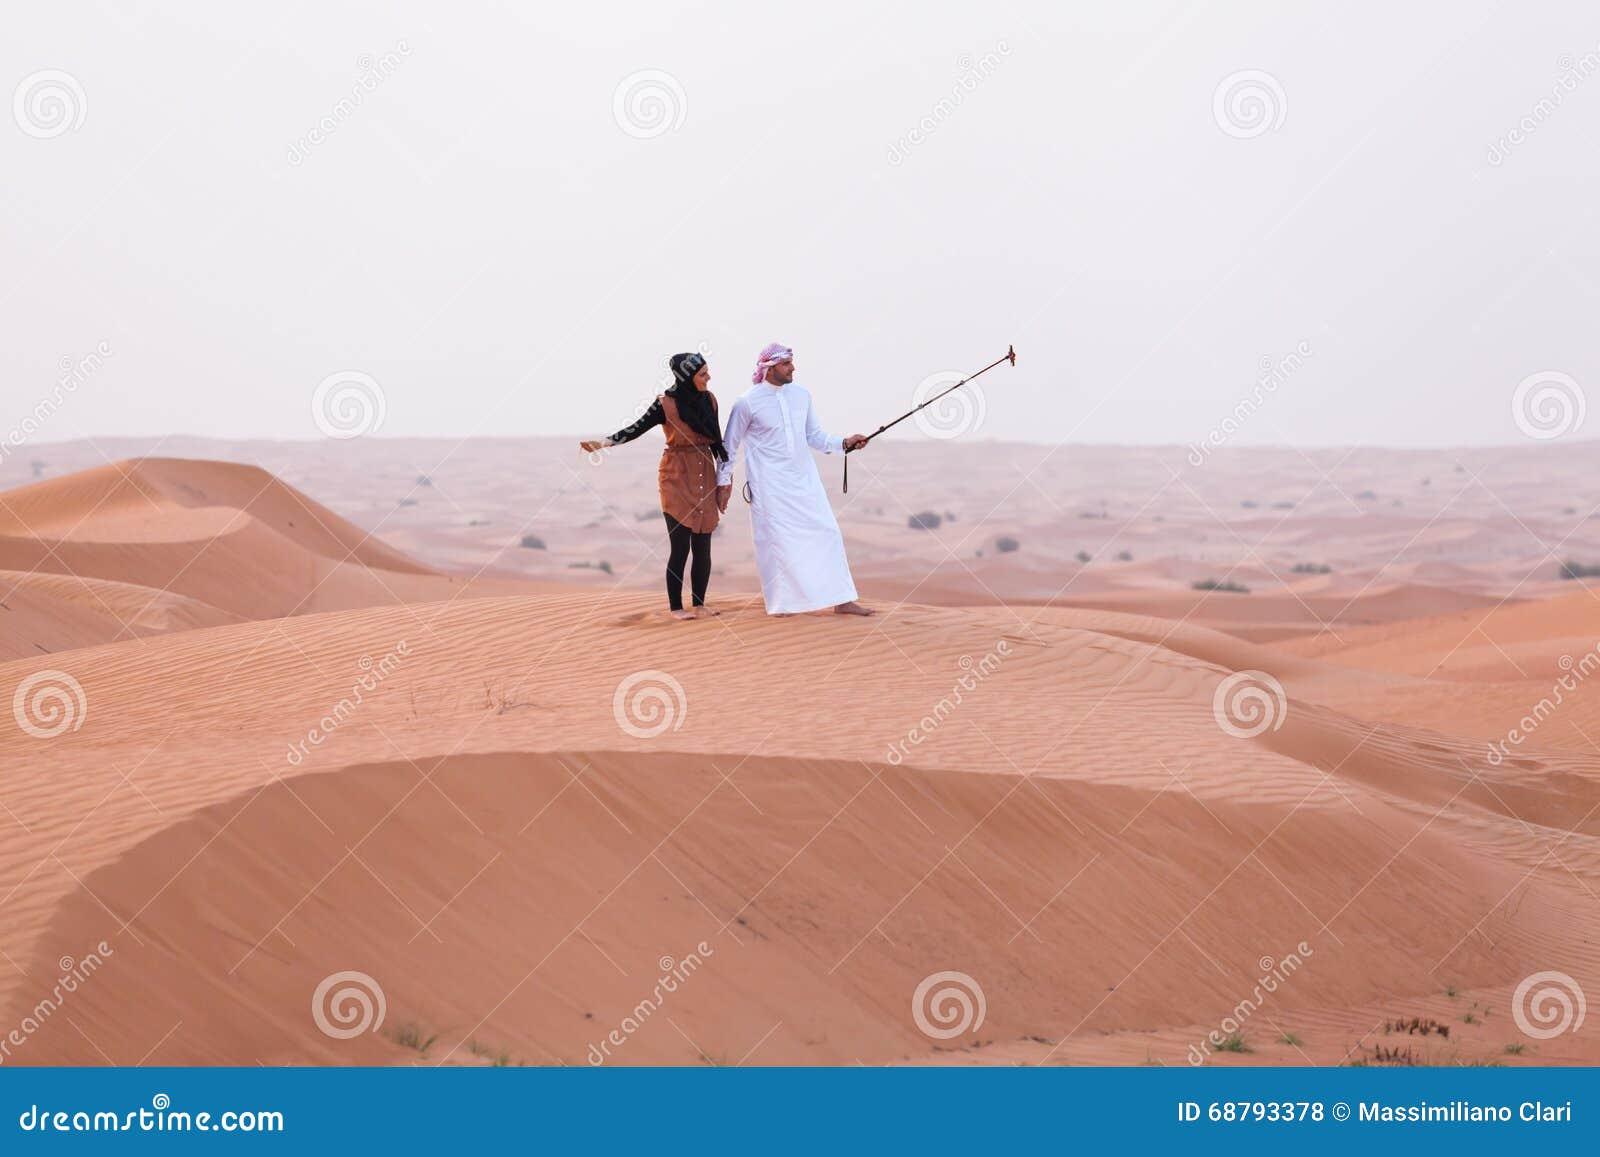 DUBAI, UAE - 11 MAY, 2014: Safari - driving on the desert, tradi